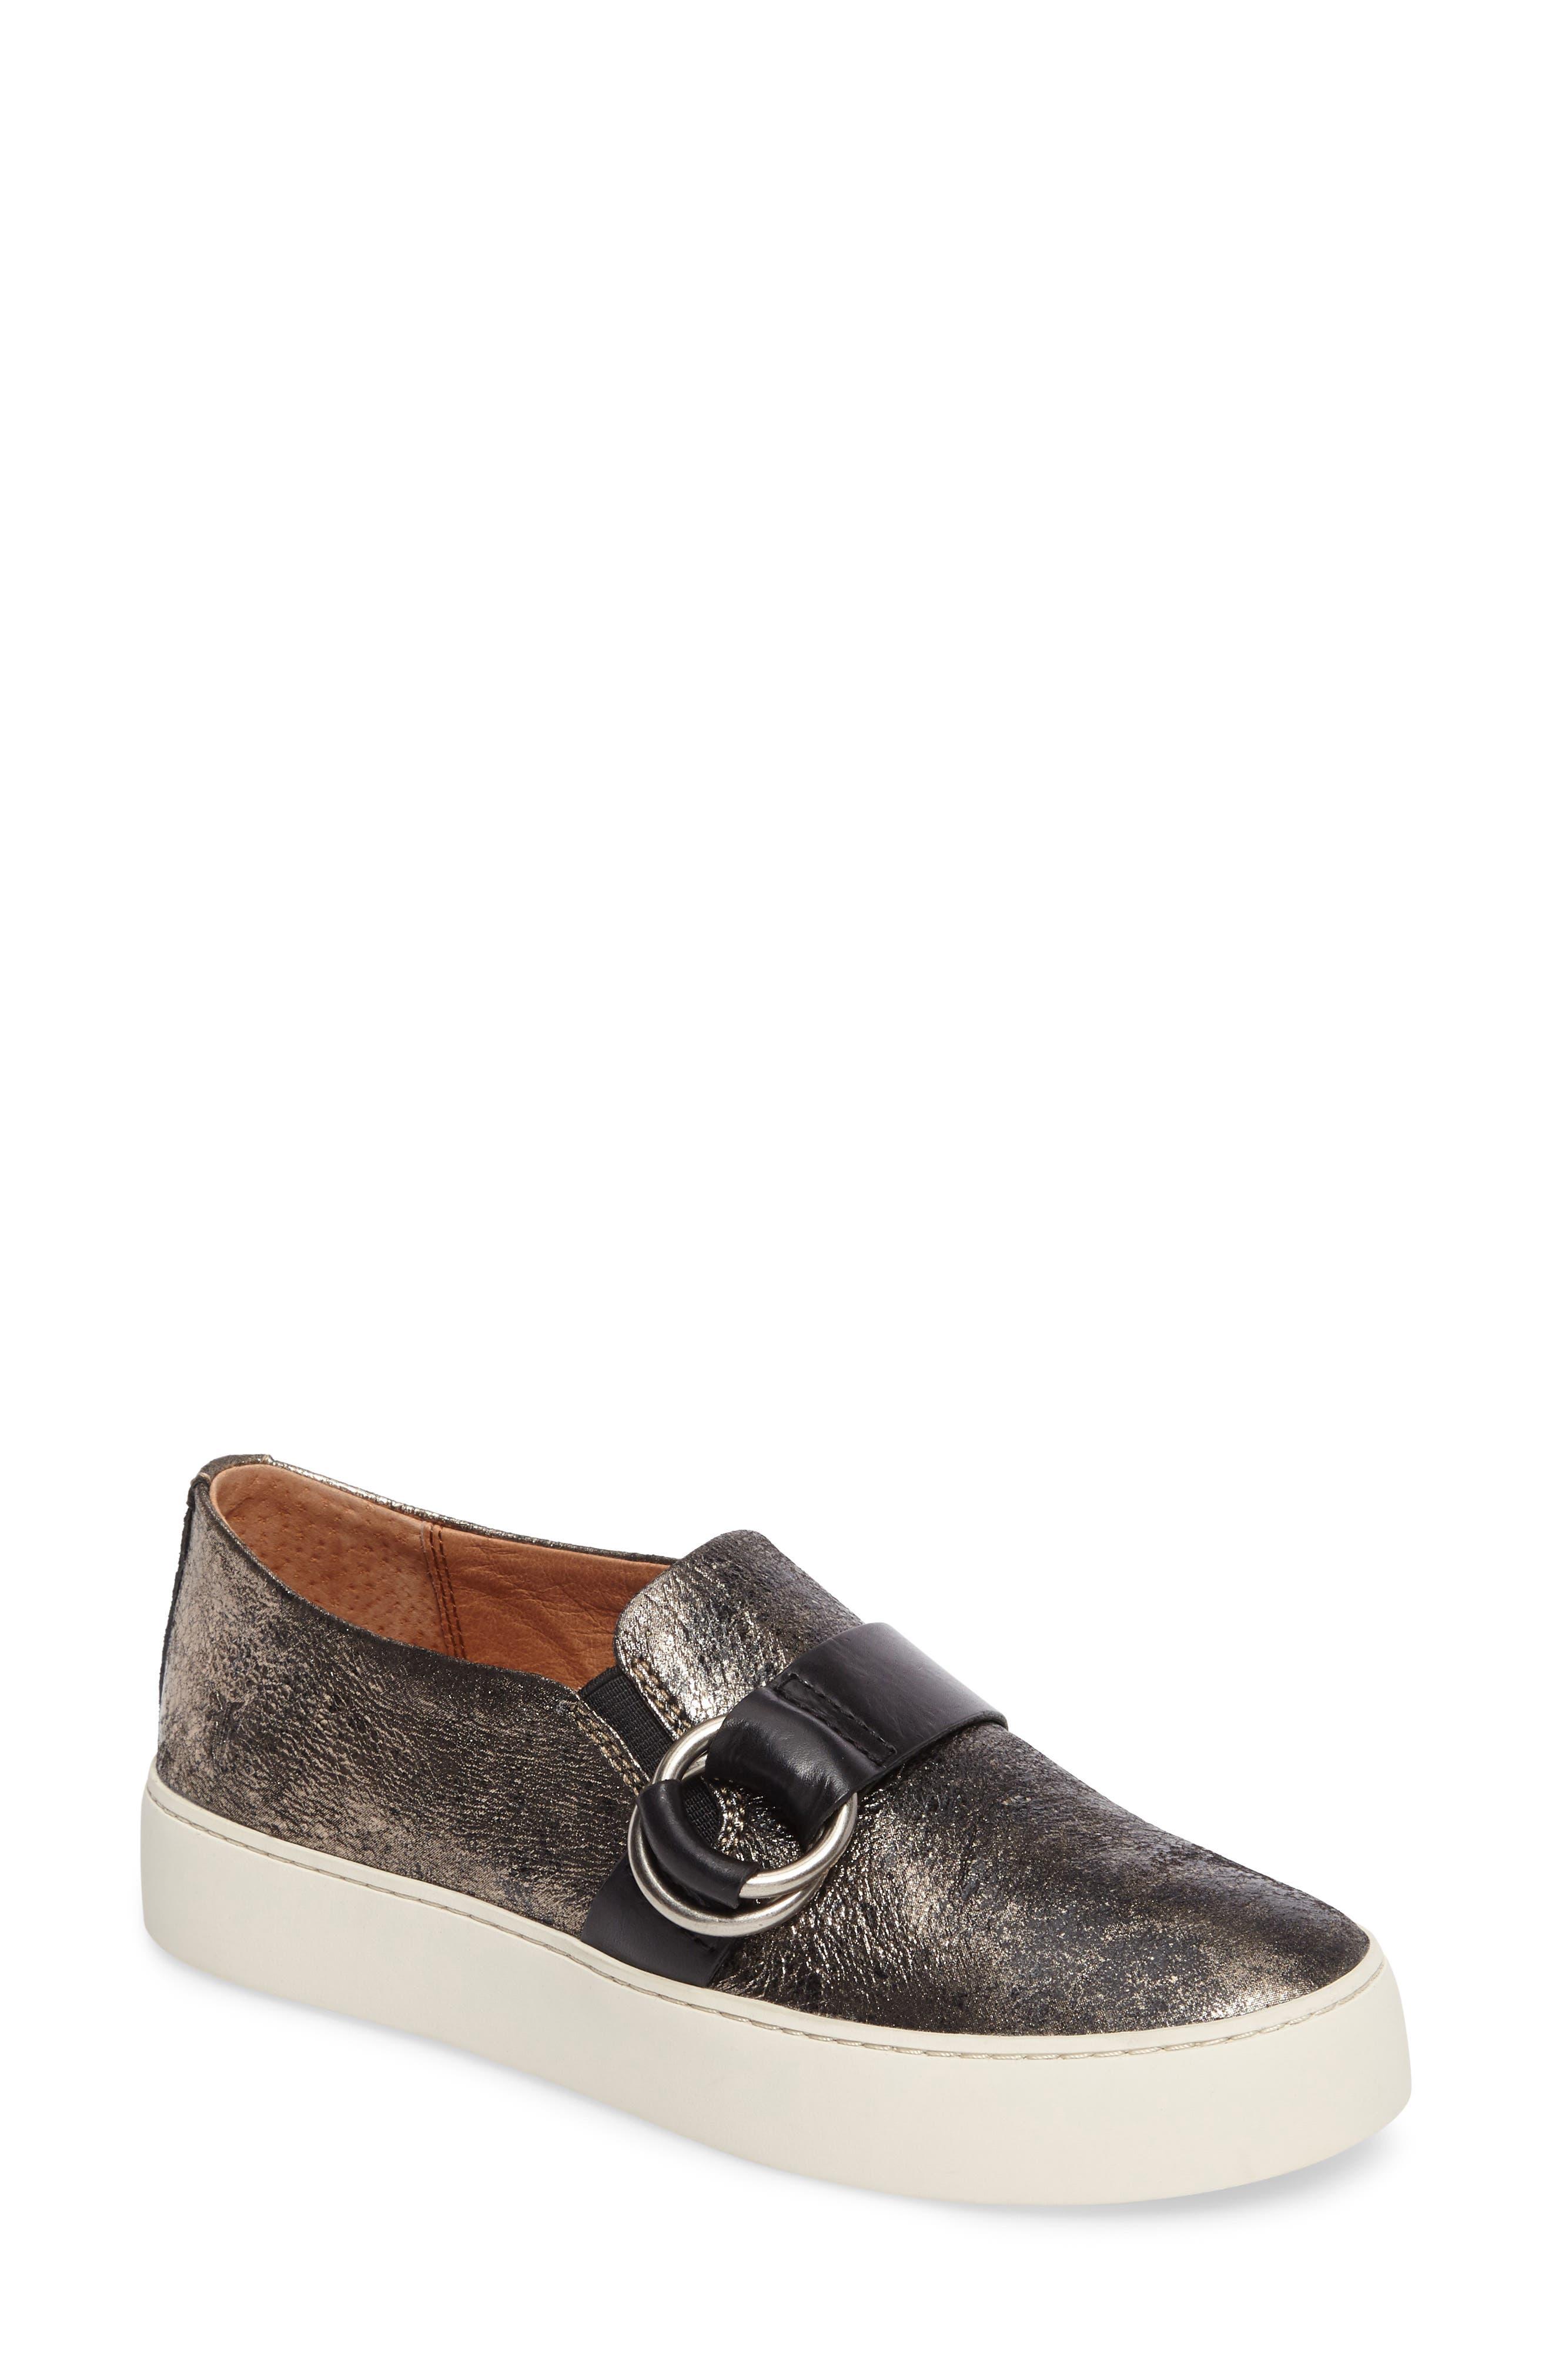 Lena Harness Slip-On Sneaker,                         Main,                         color, Gunmetal